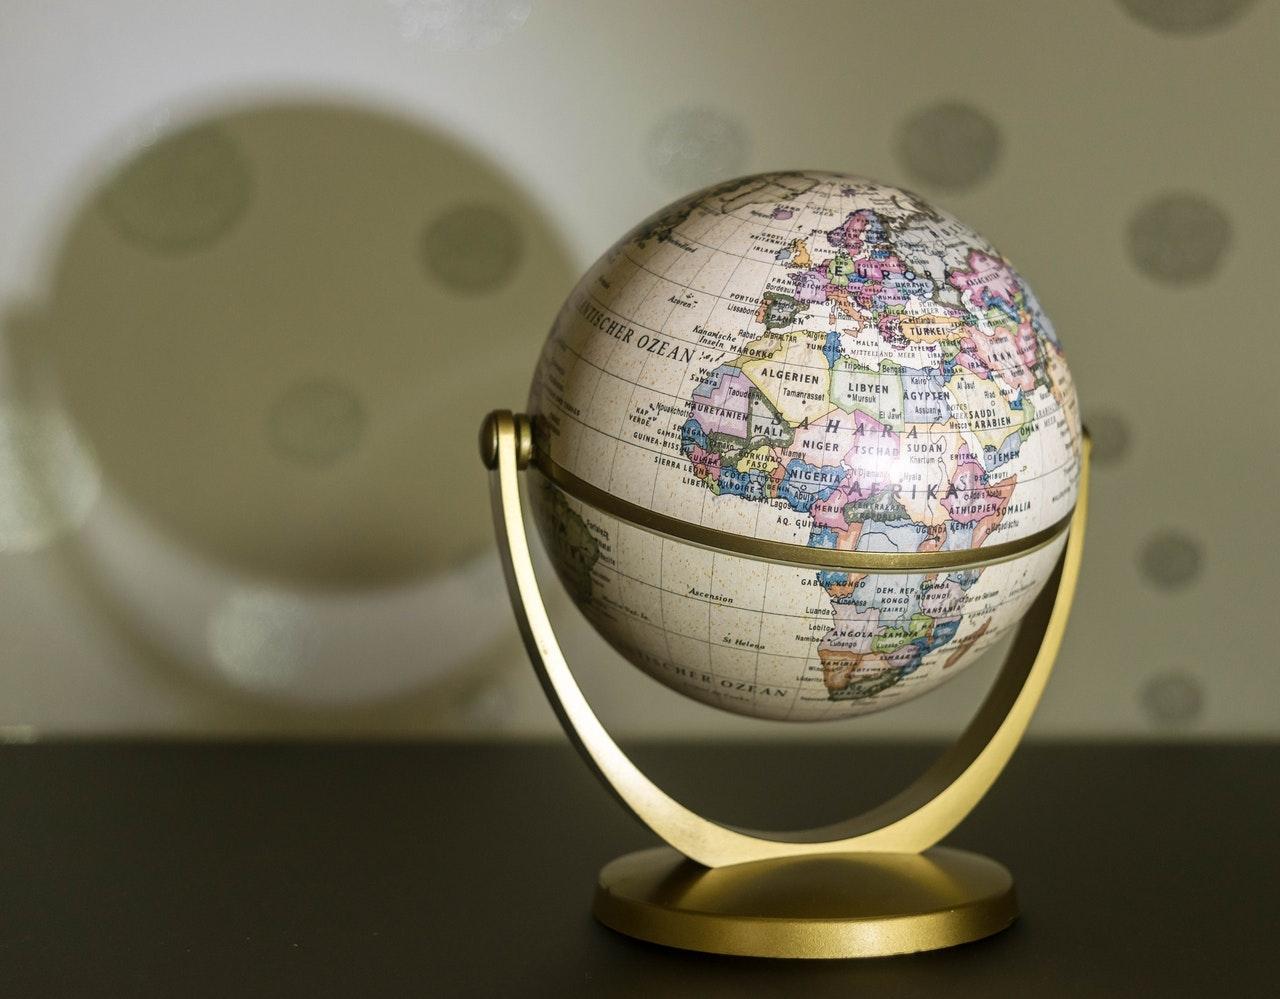 VRMA's Worldwide Reach